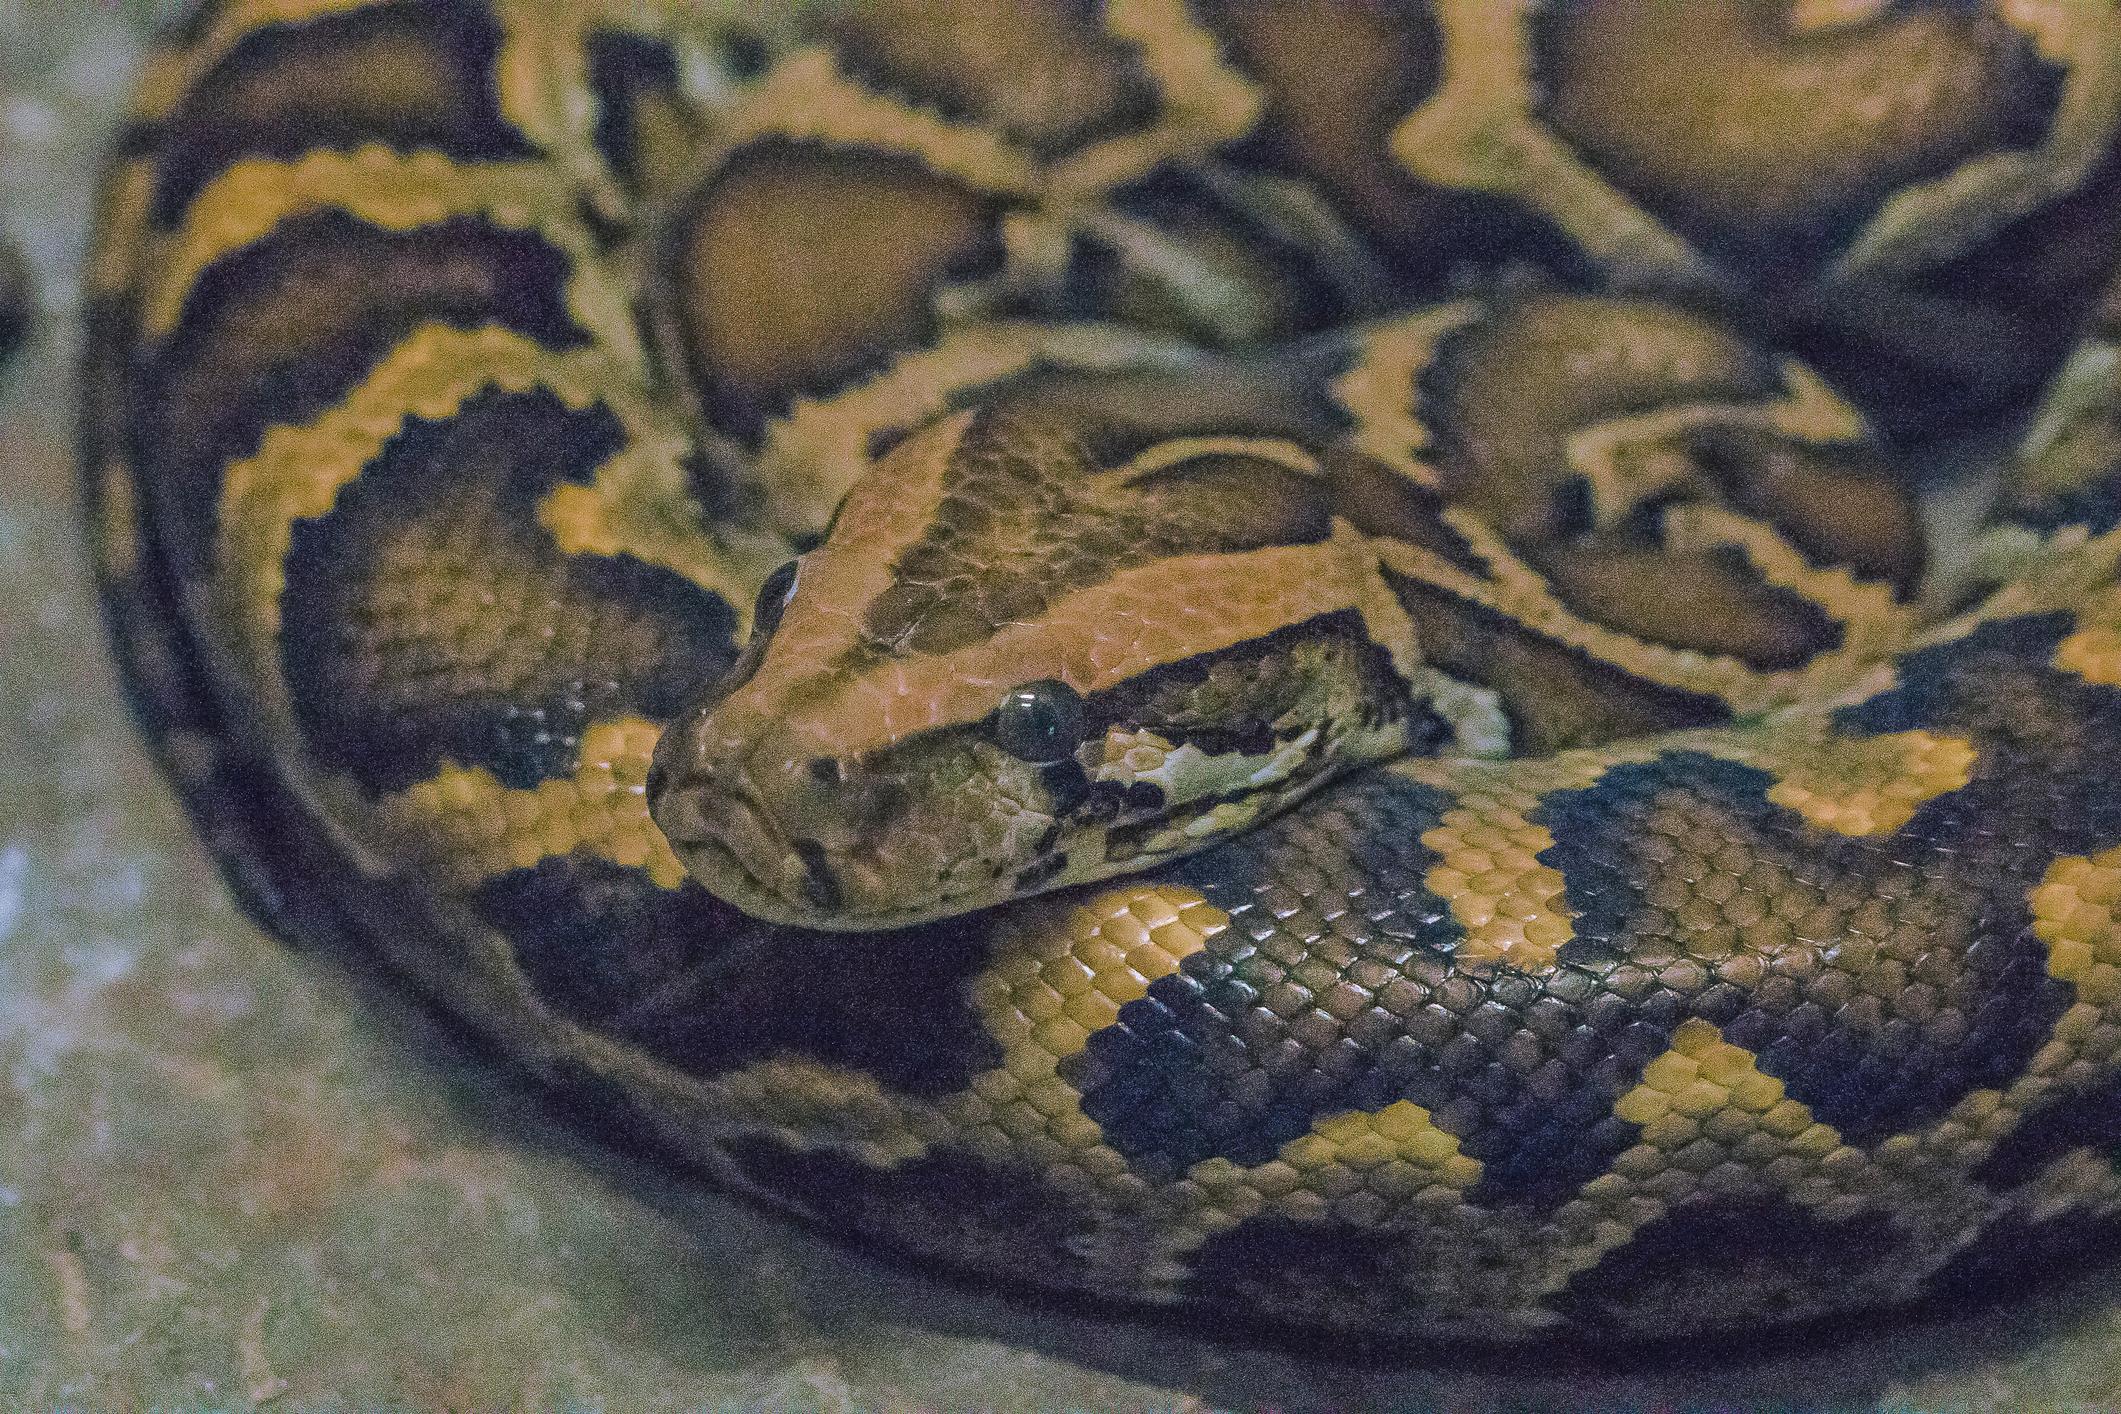 Twenty Burmese pythons discovered in Utah man's house